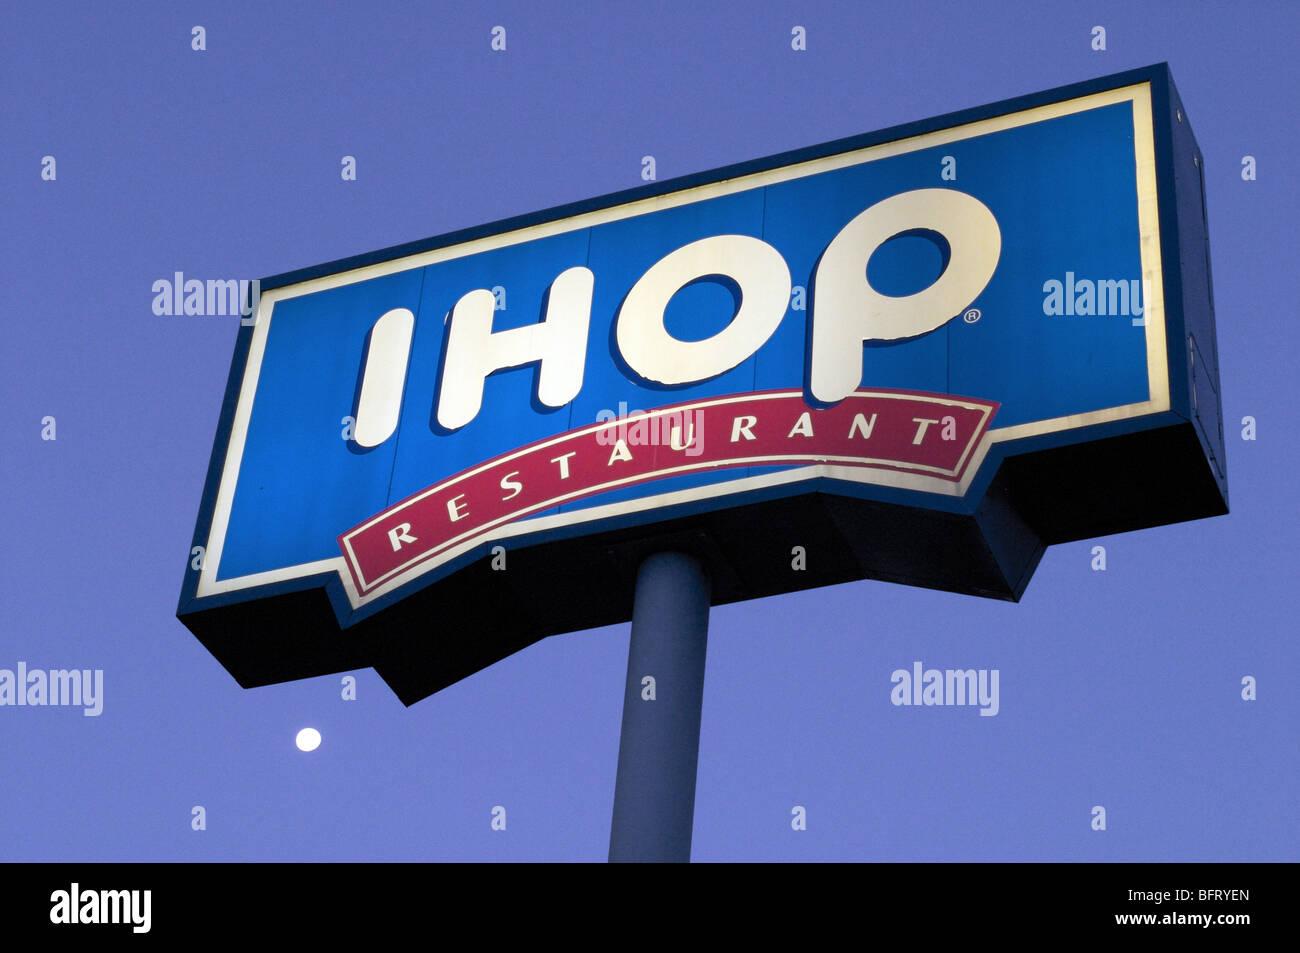 Ihop sign, Dallas , Texas Stock Photo, Royalty Free Image ...